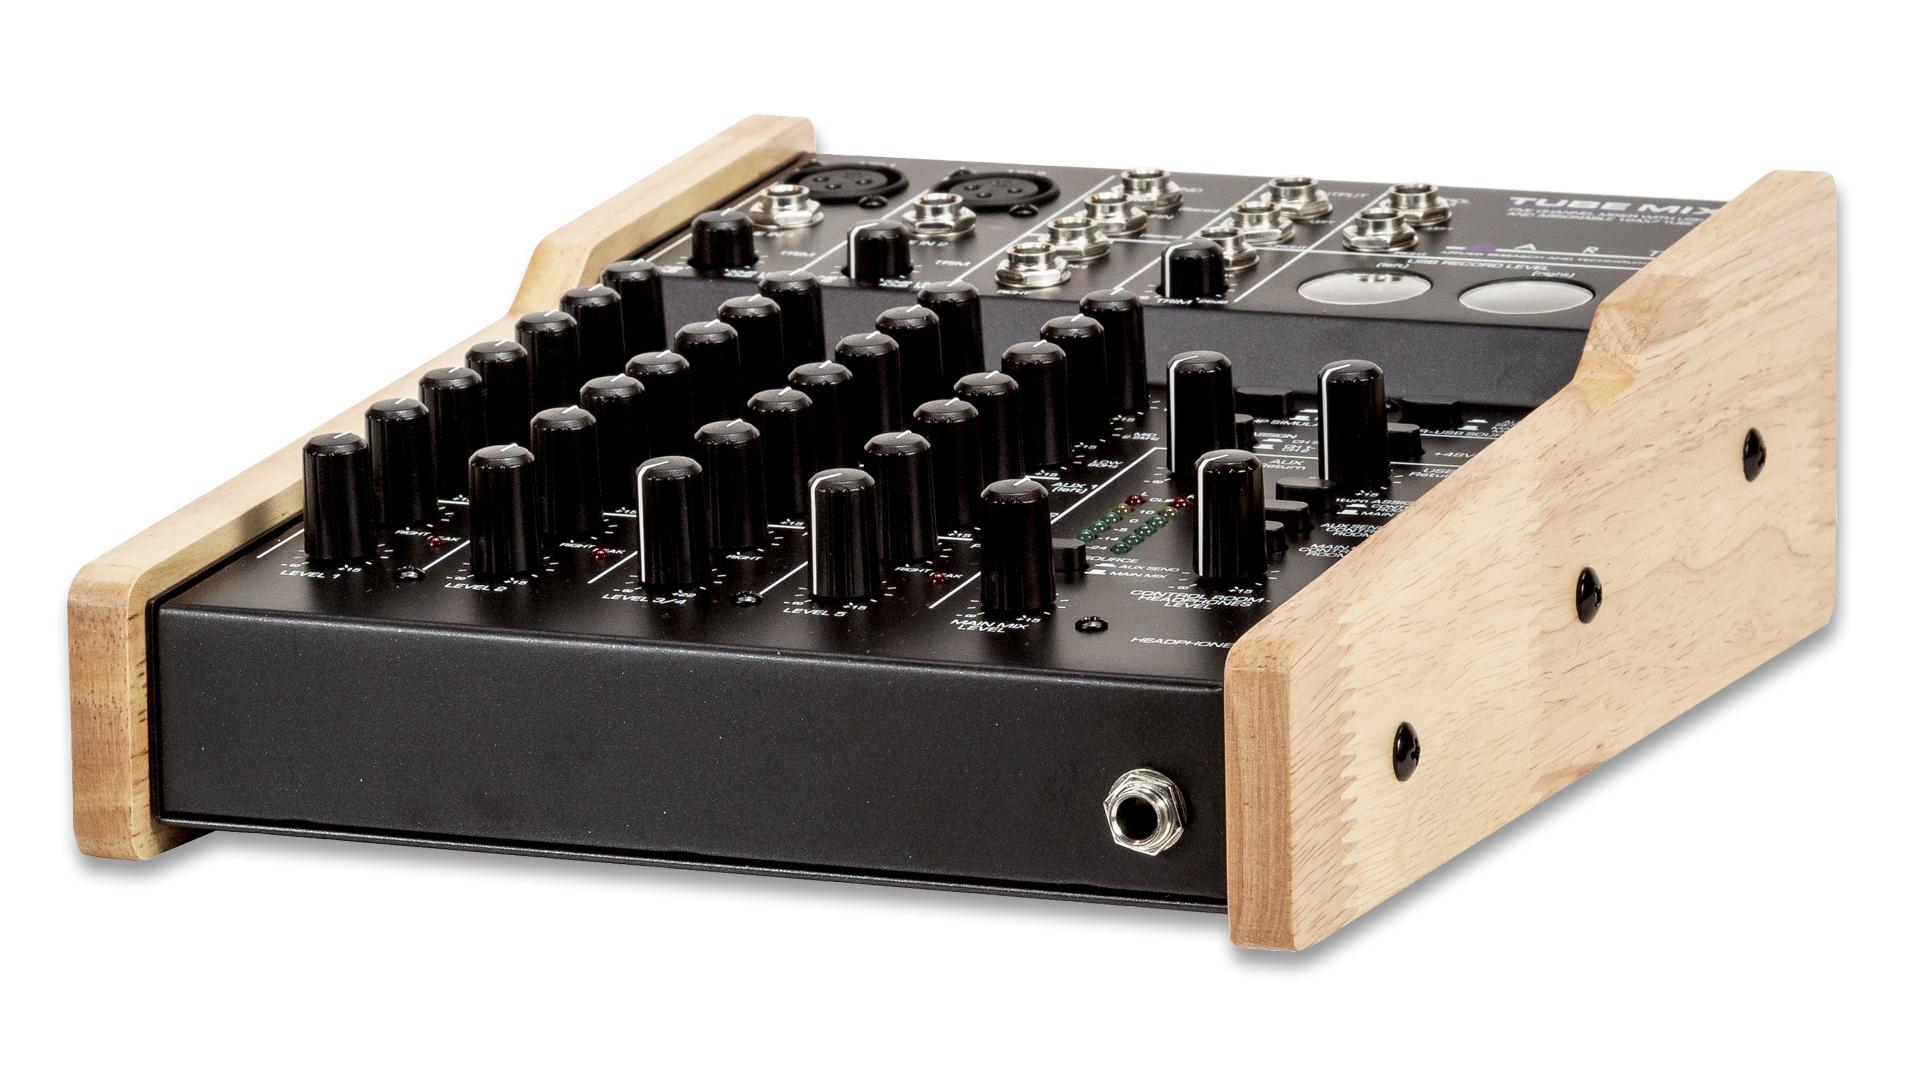 ART Audio TubeMix - digital output with a valve preamp!